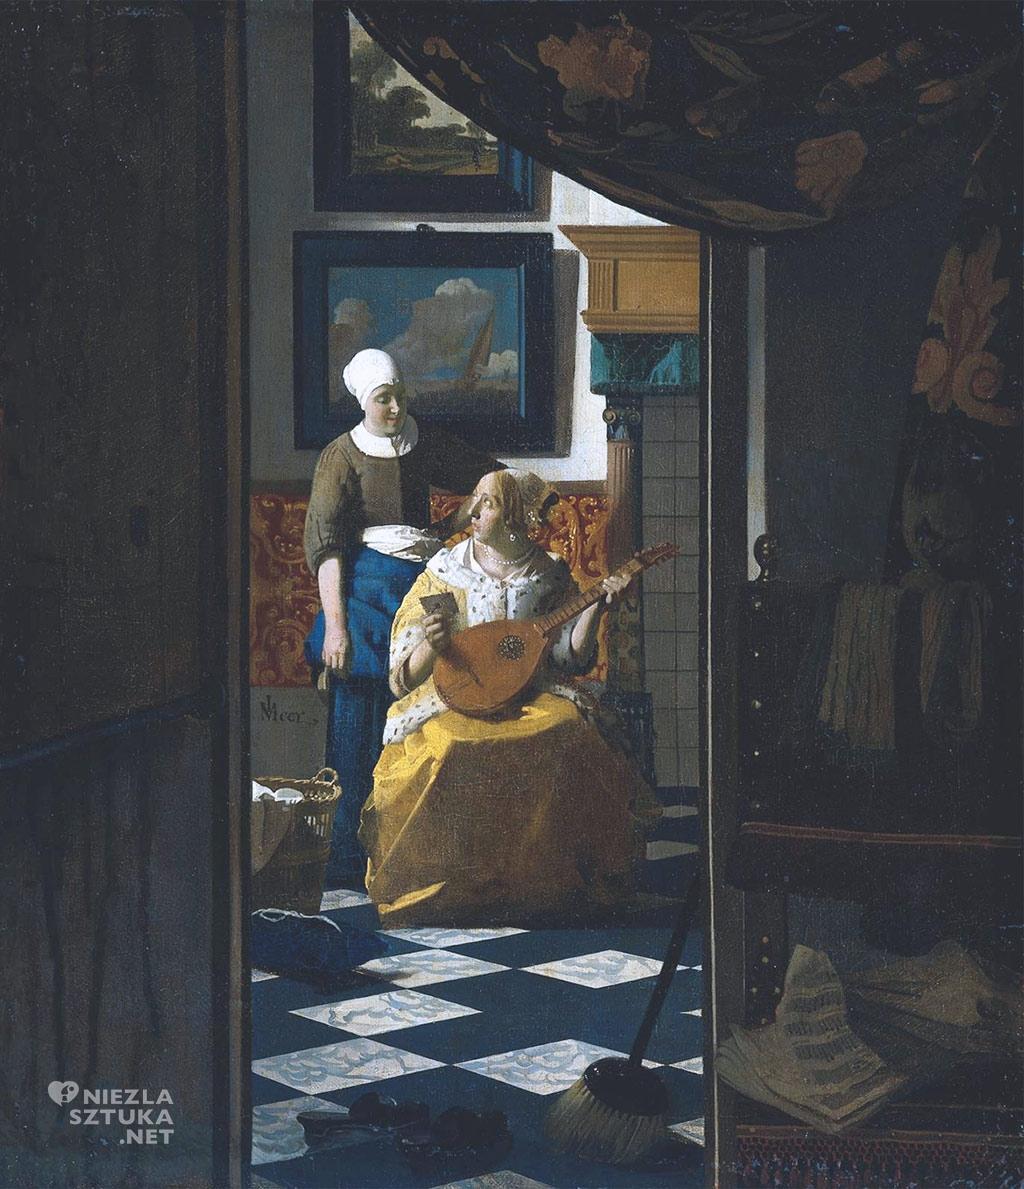 Johannes Vermeer, List miłosny, malarstwo niderlandzkie, Niezła Sztuka